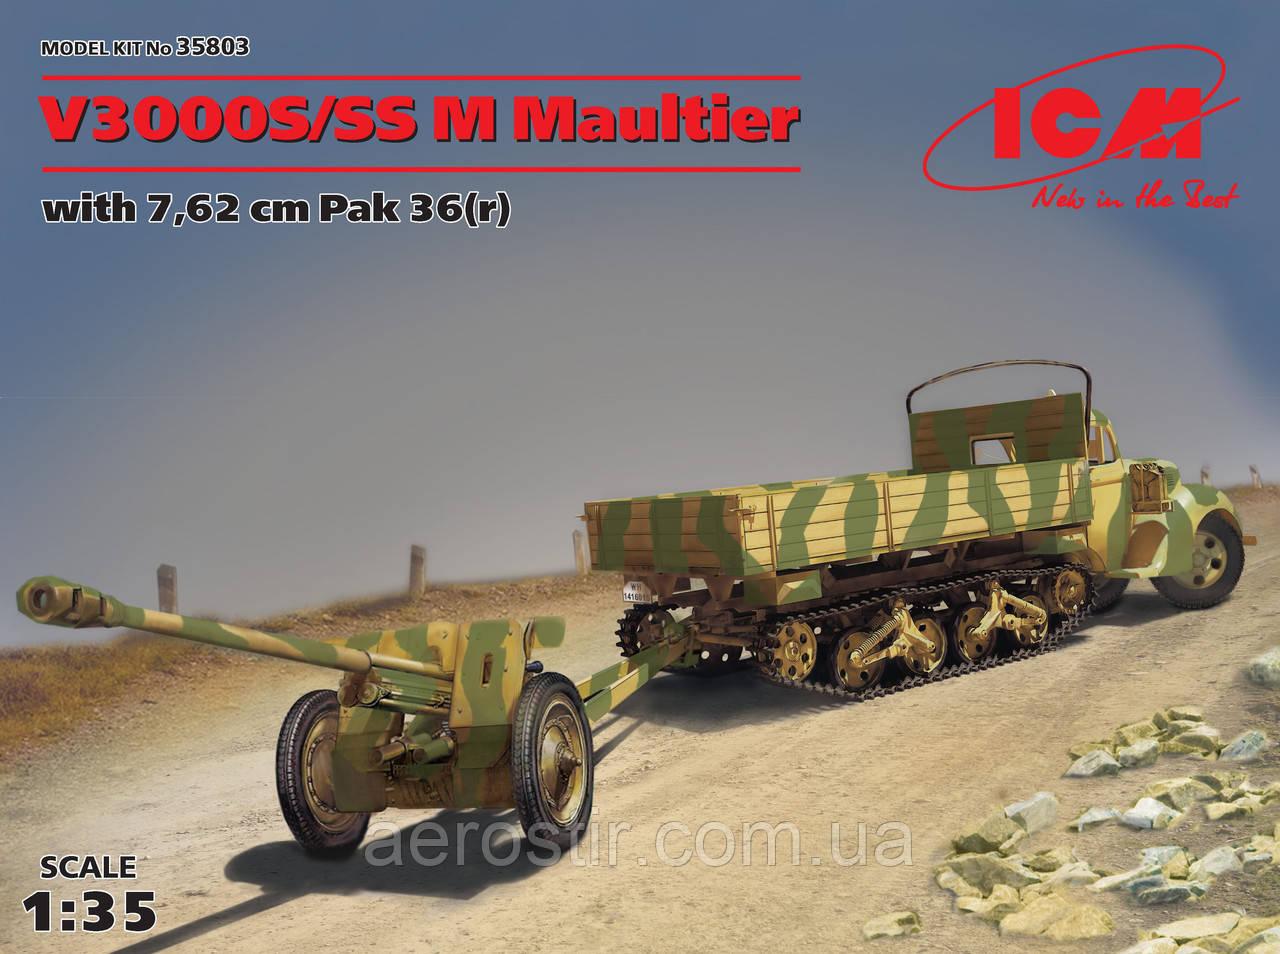 V3000S/SS M MAULTIER с пушкой Pak36[r] 1/35 ICM 35803